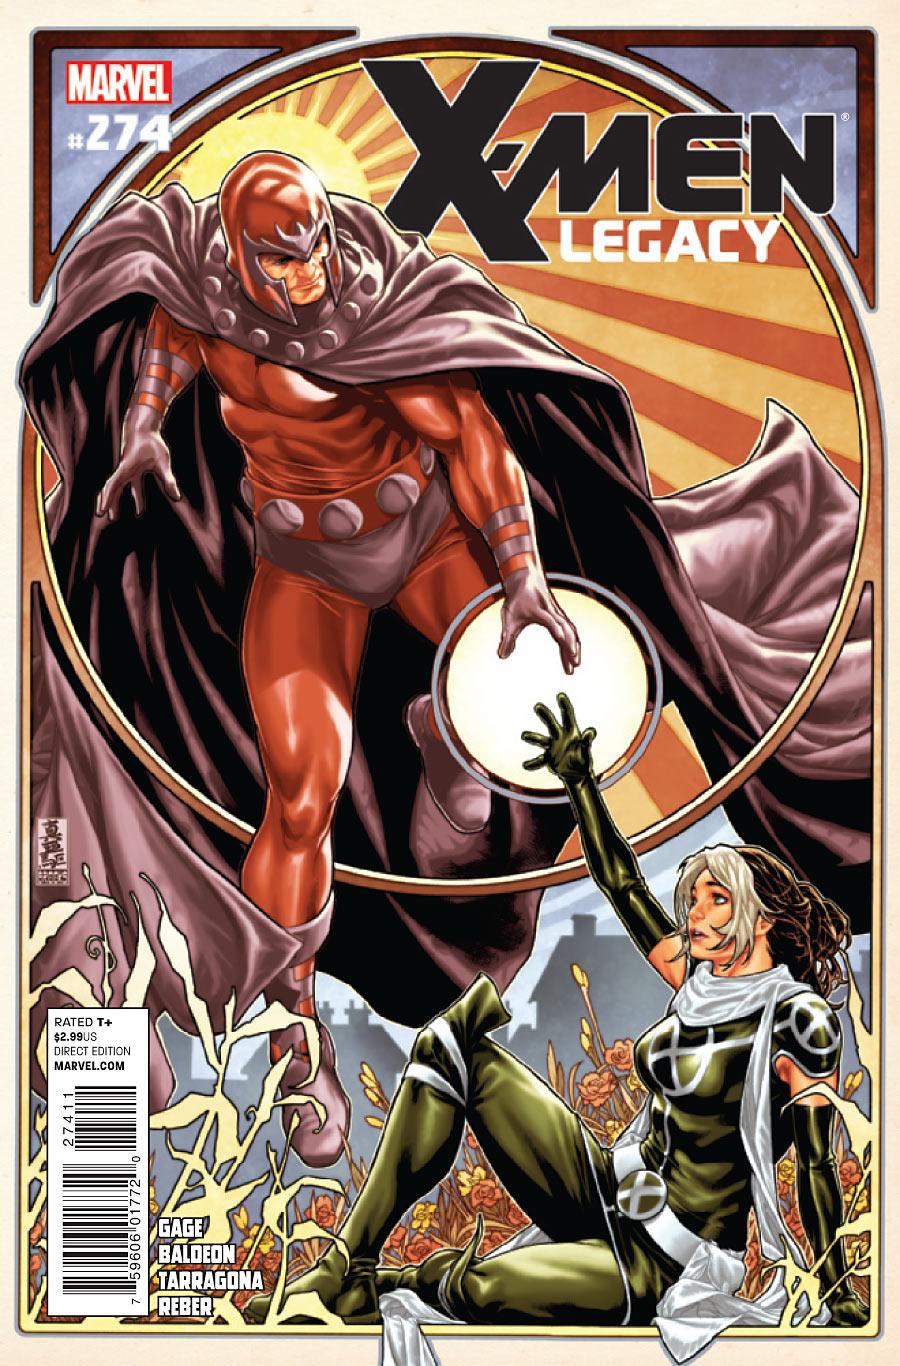 X-Men: Legacy Vol 1 274